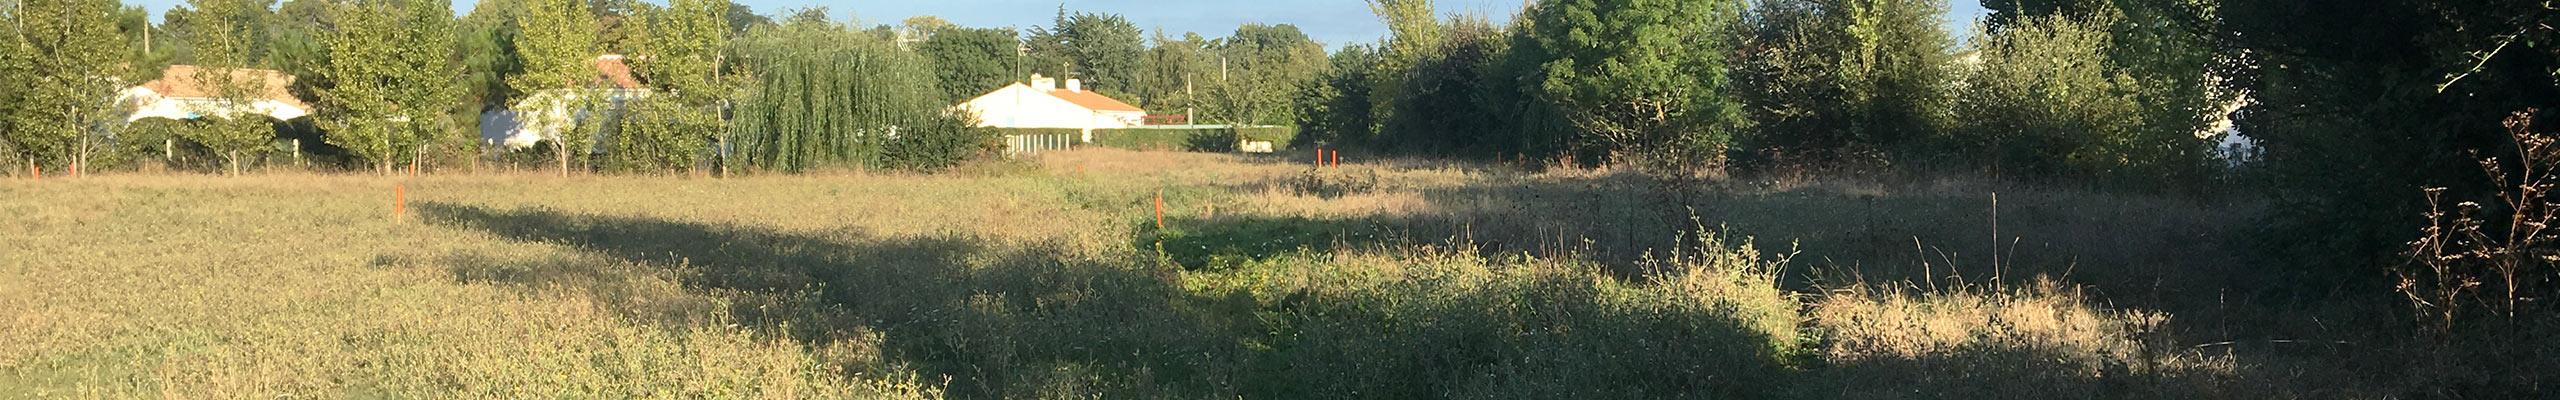 terrain-en-vente-La-Barre-de-Monts